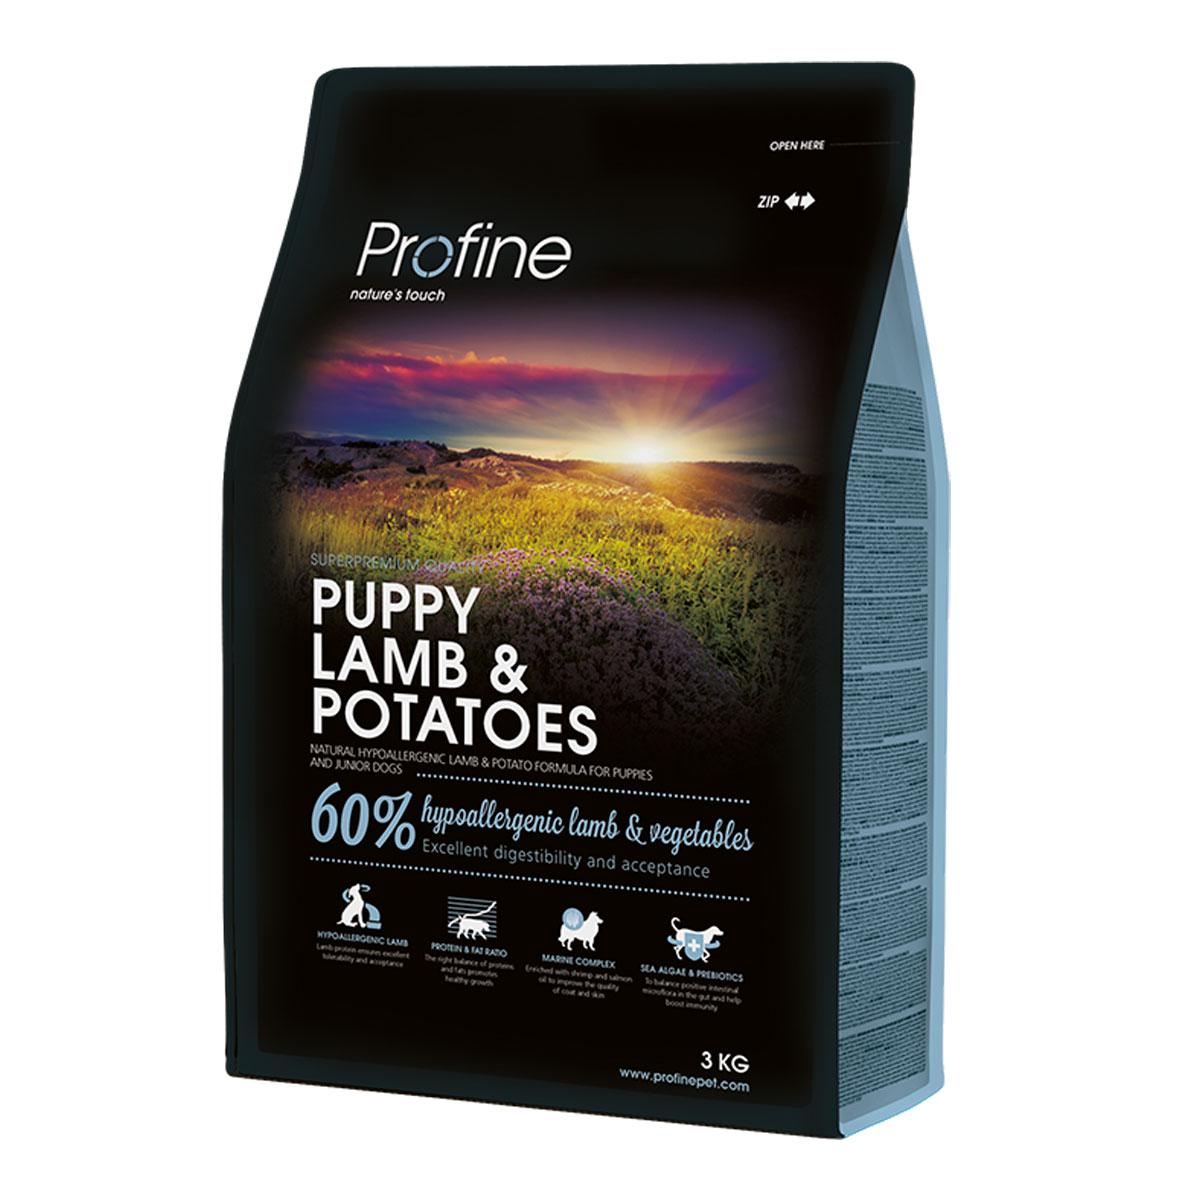 Profine Puppy Lamb and Potatoes 15kg